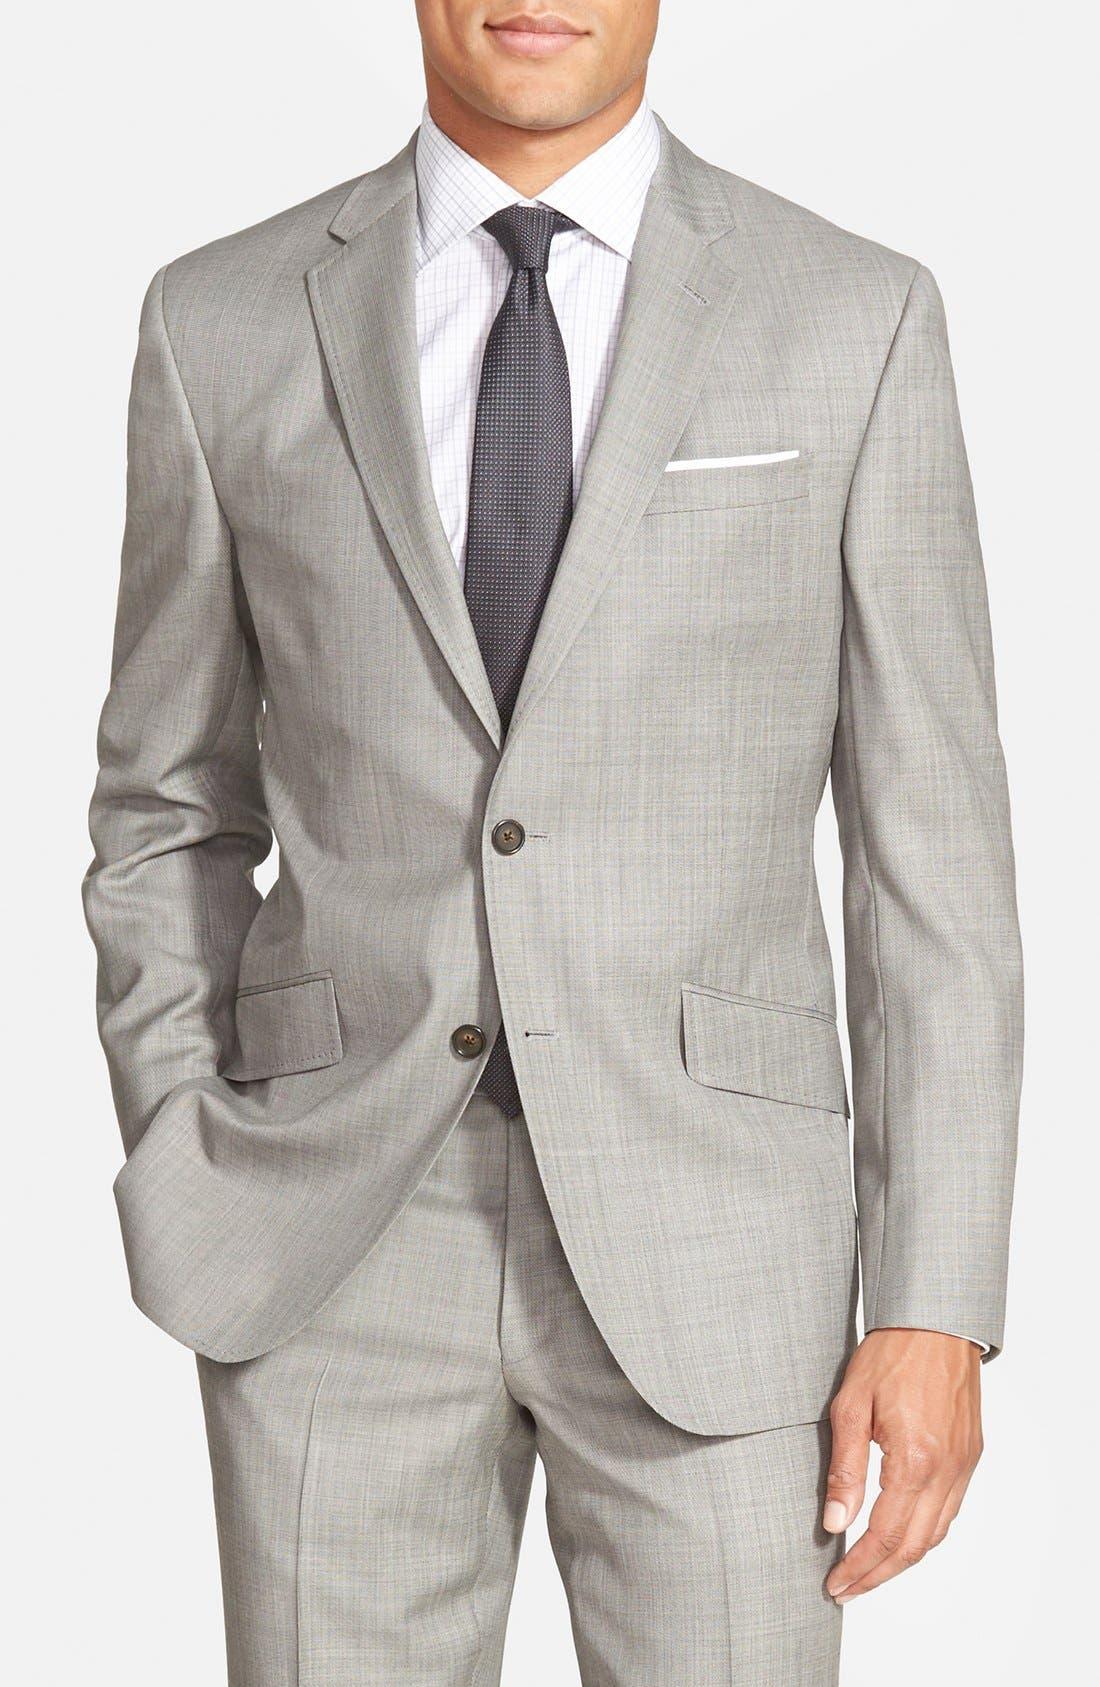 Jones Trim Fit Wool Suit,                             Alternate thumbnail 4, color,                             Medium Grey